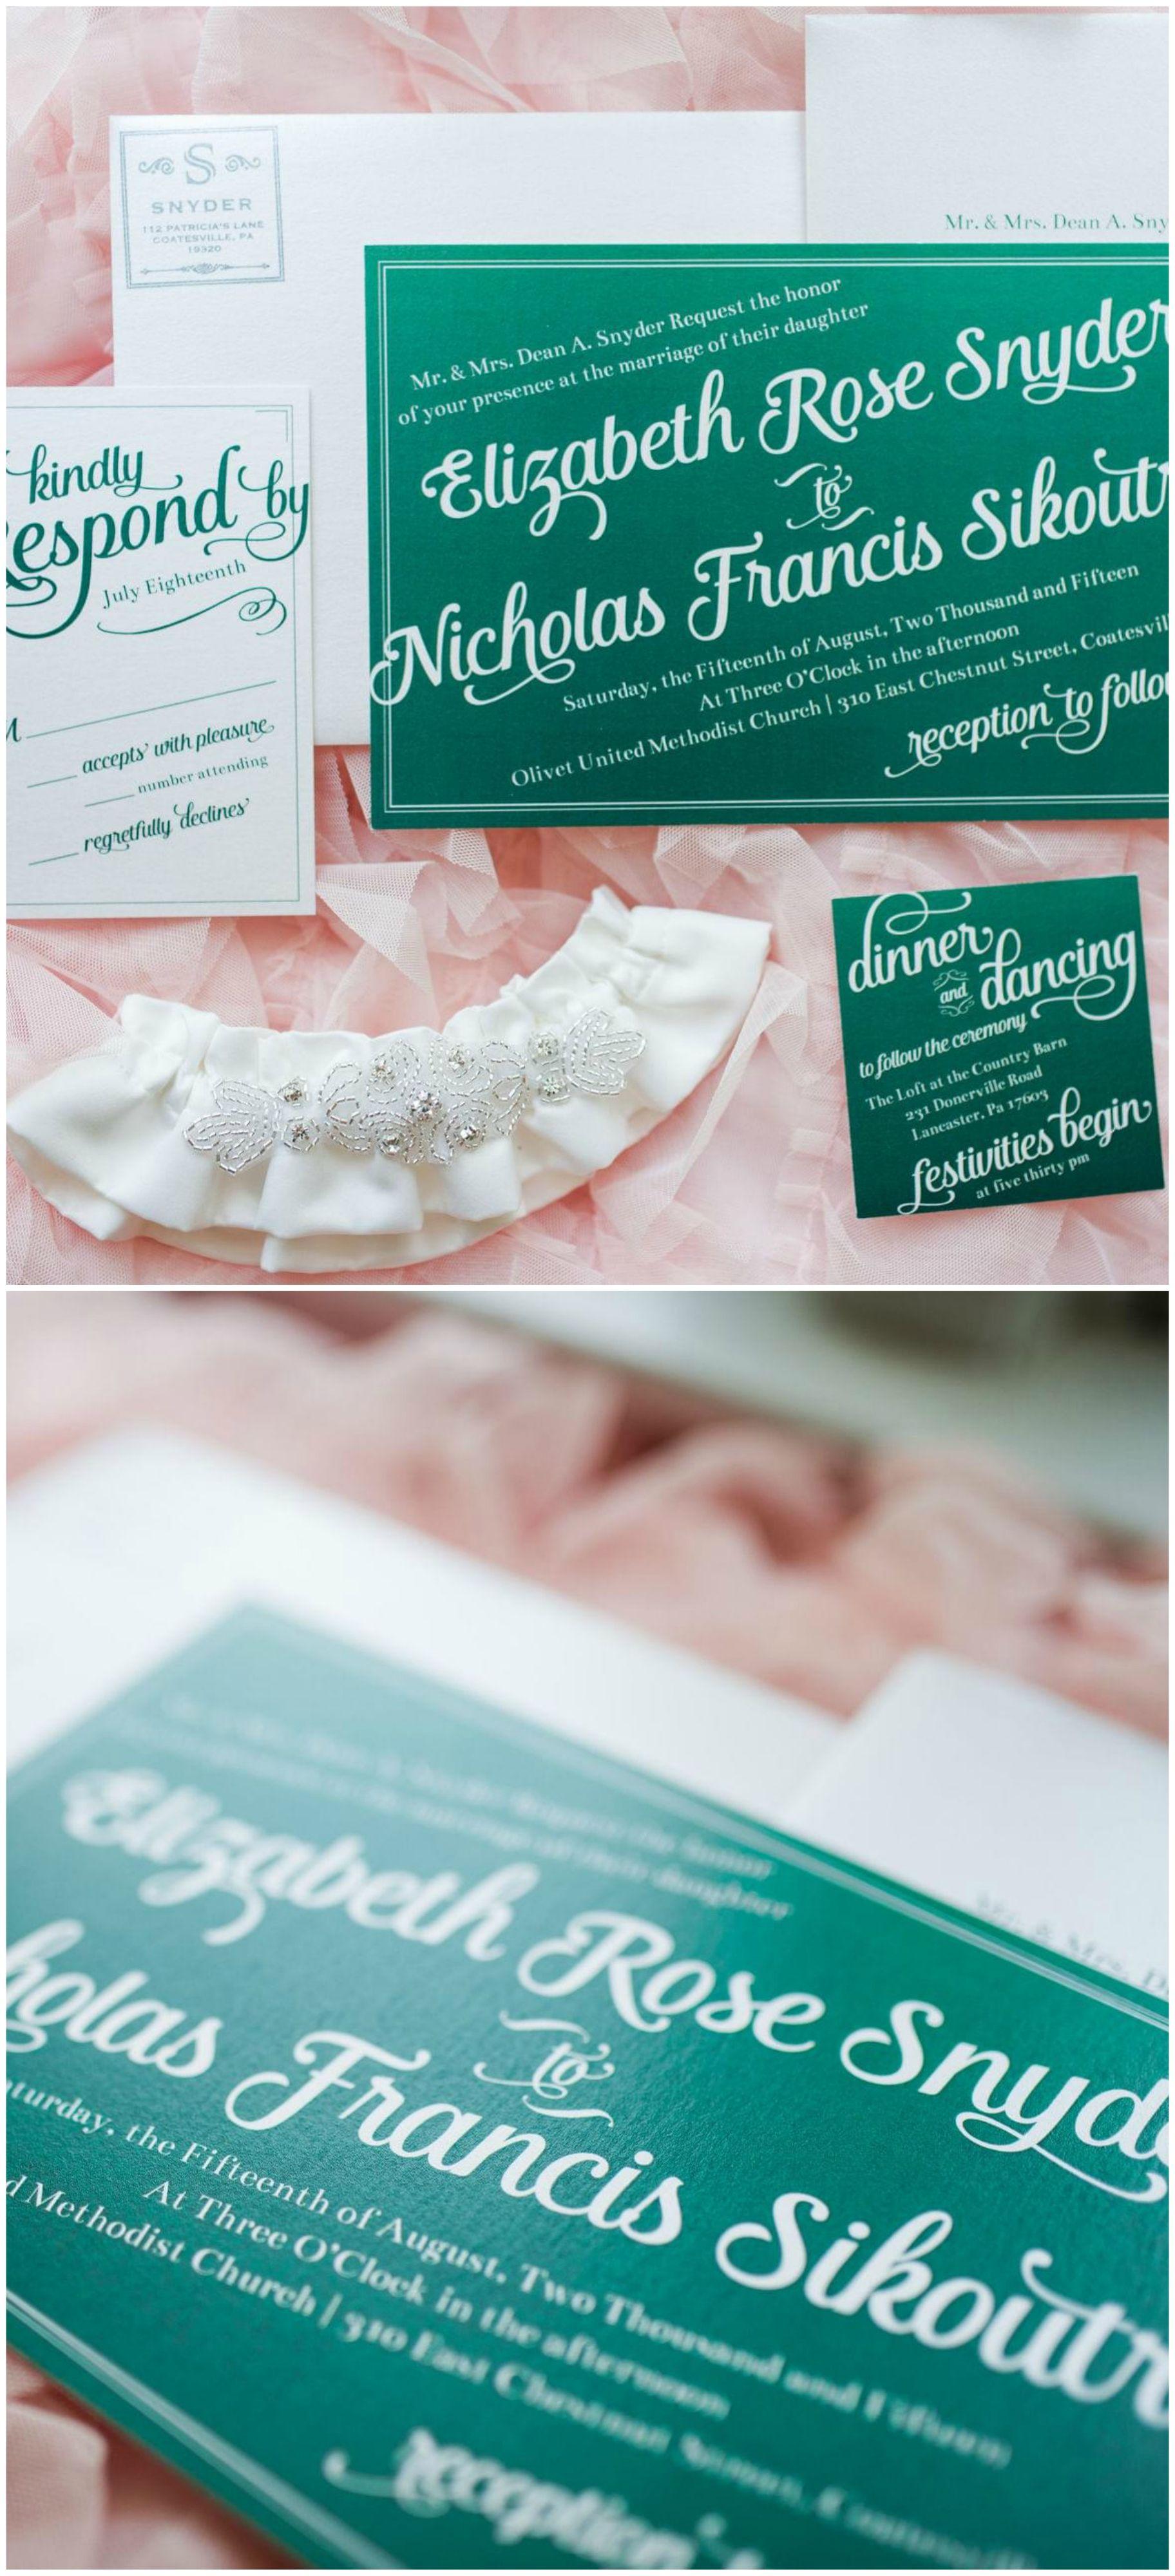 Turquoise pastel pink wedding invitations white calligraphy turquoise pastel pink wedding invitations white calligraphy playful contemporary monicamarmolfo Choice Image